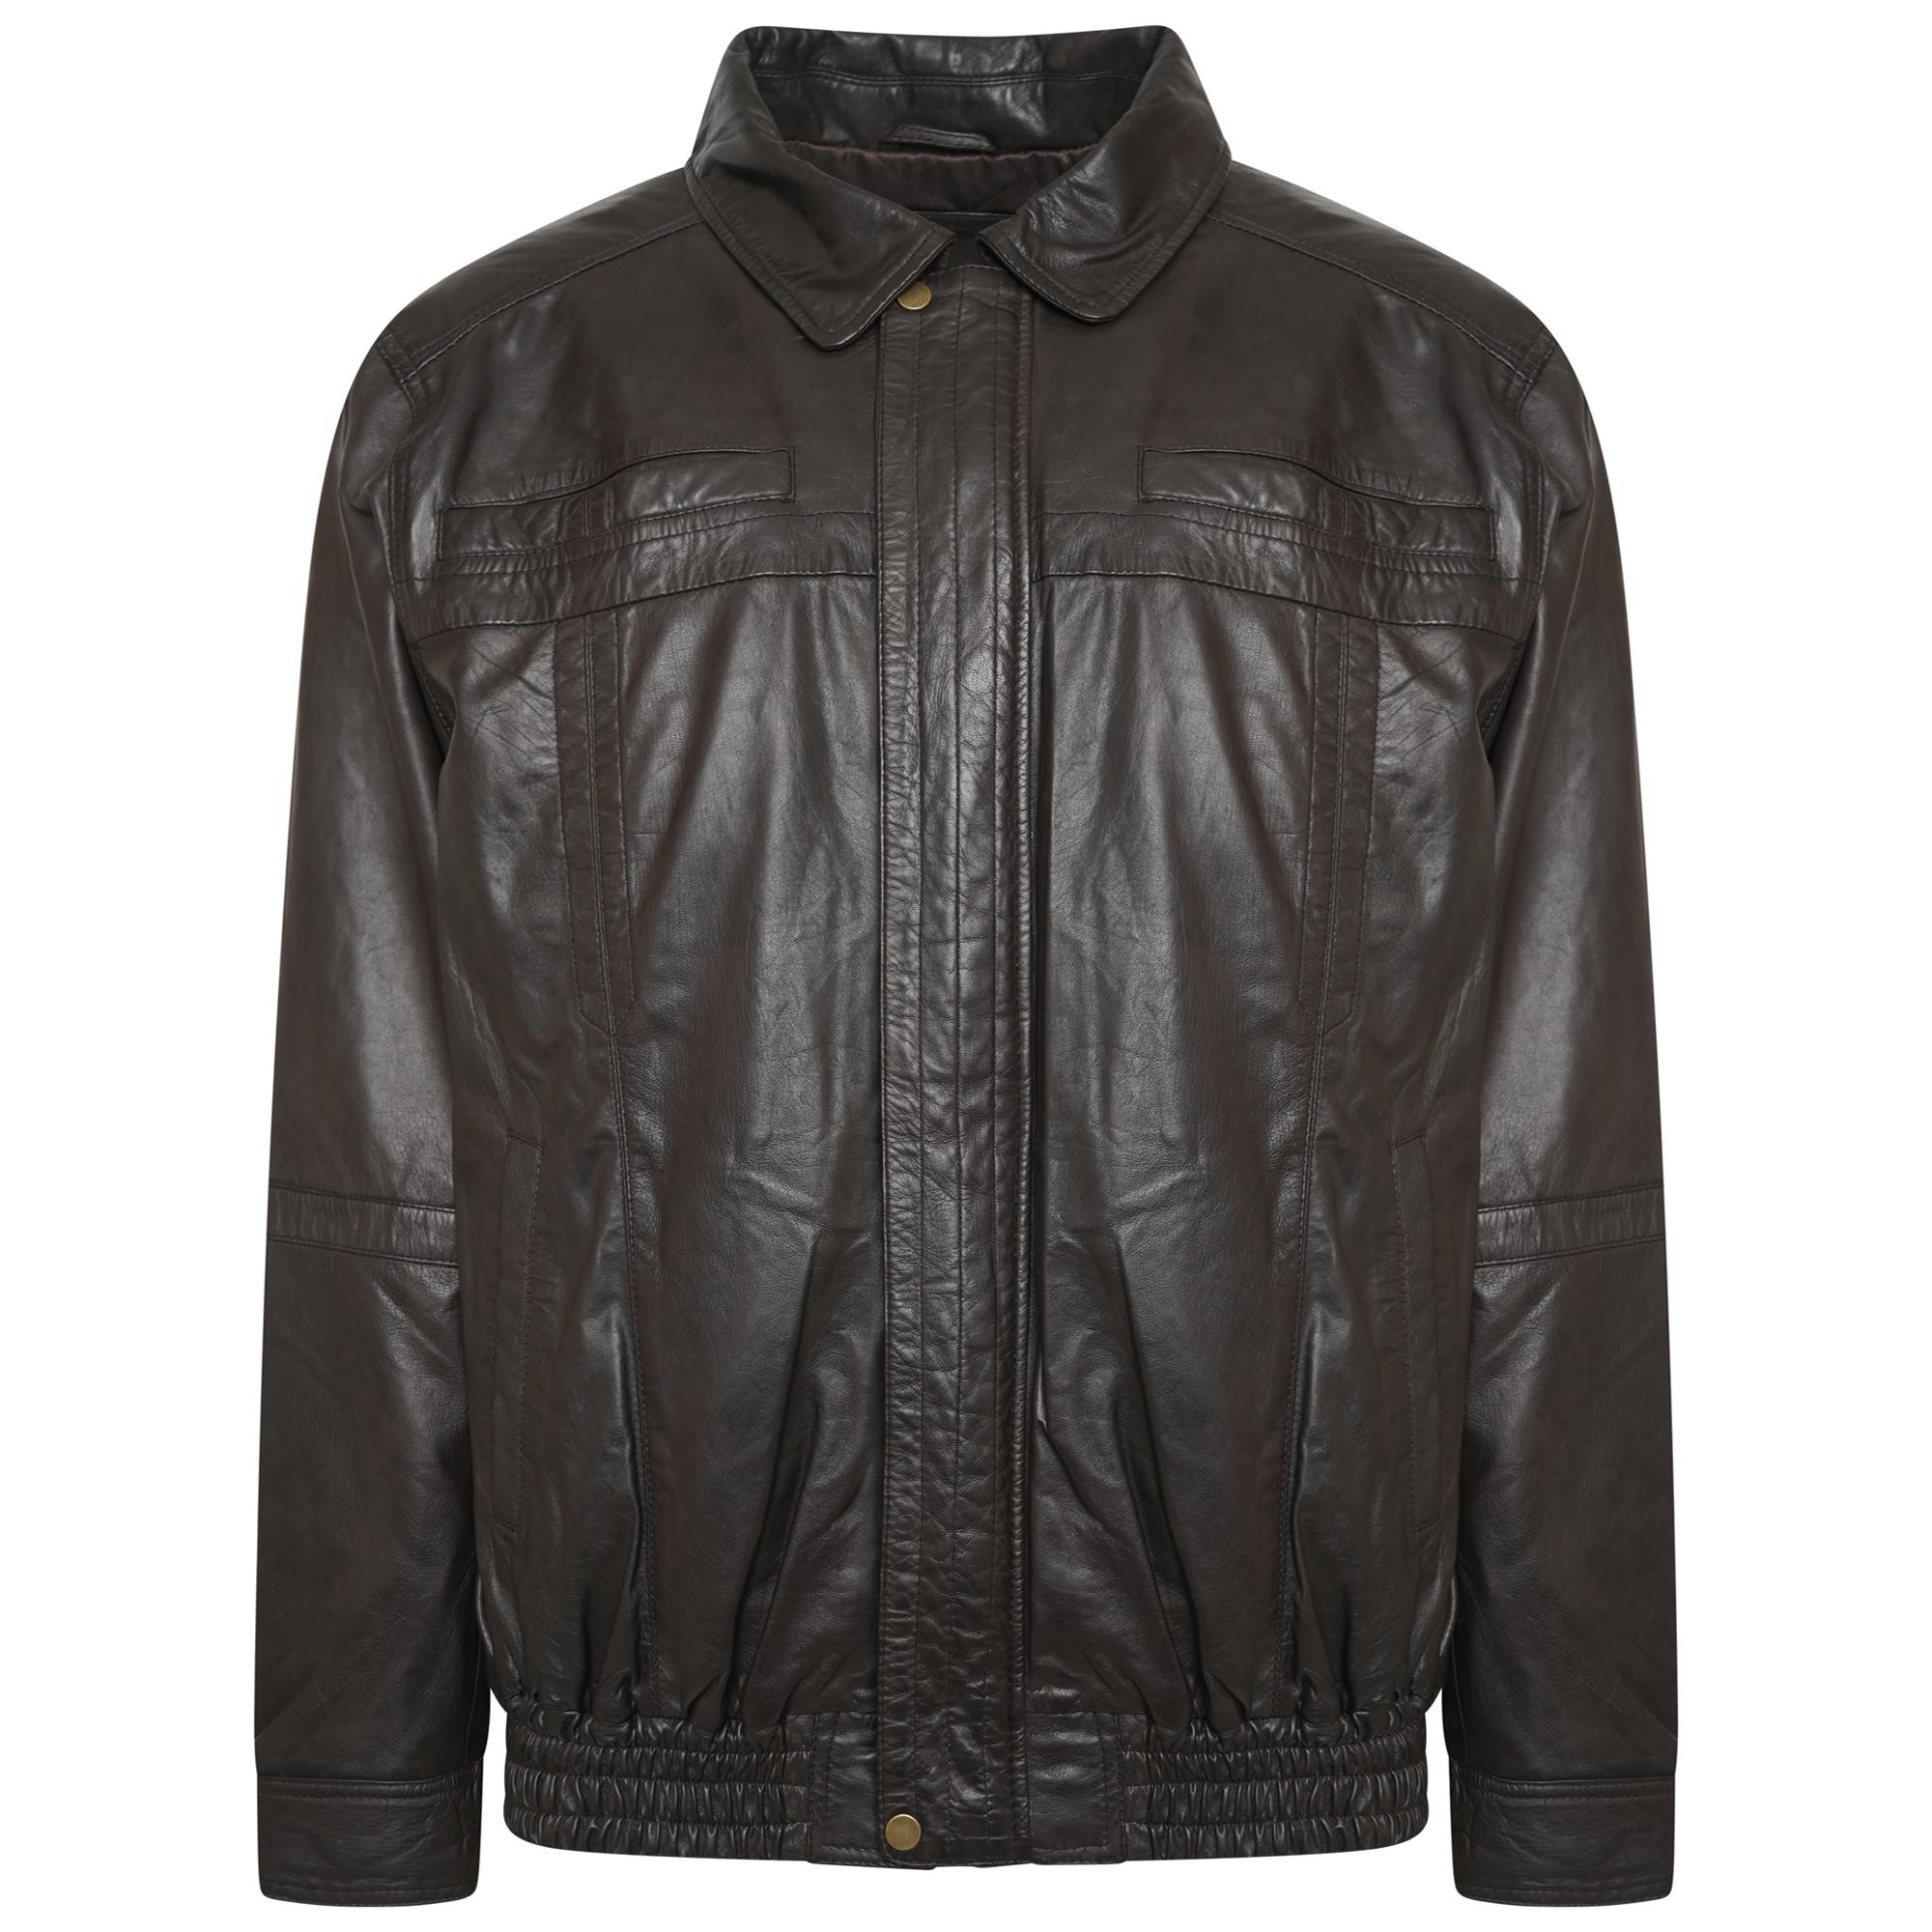 Approx. 800 x Men's Classic Heavy Duty Leather Jacket